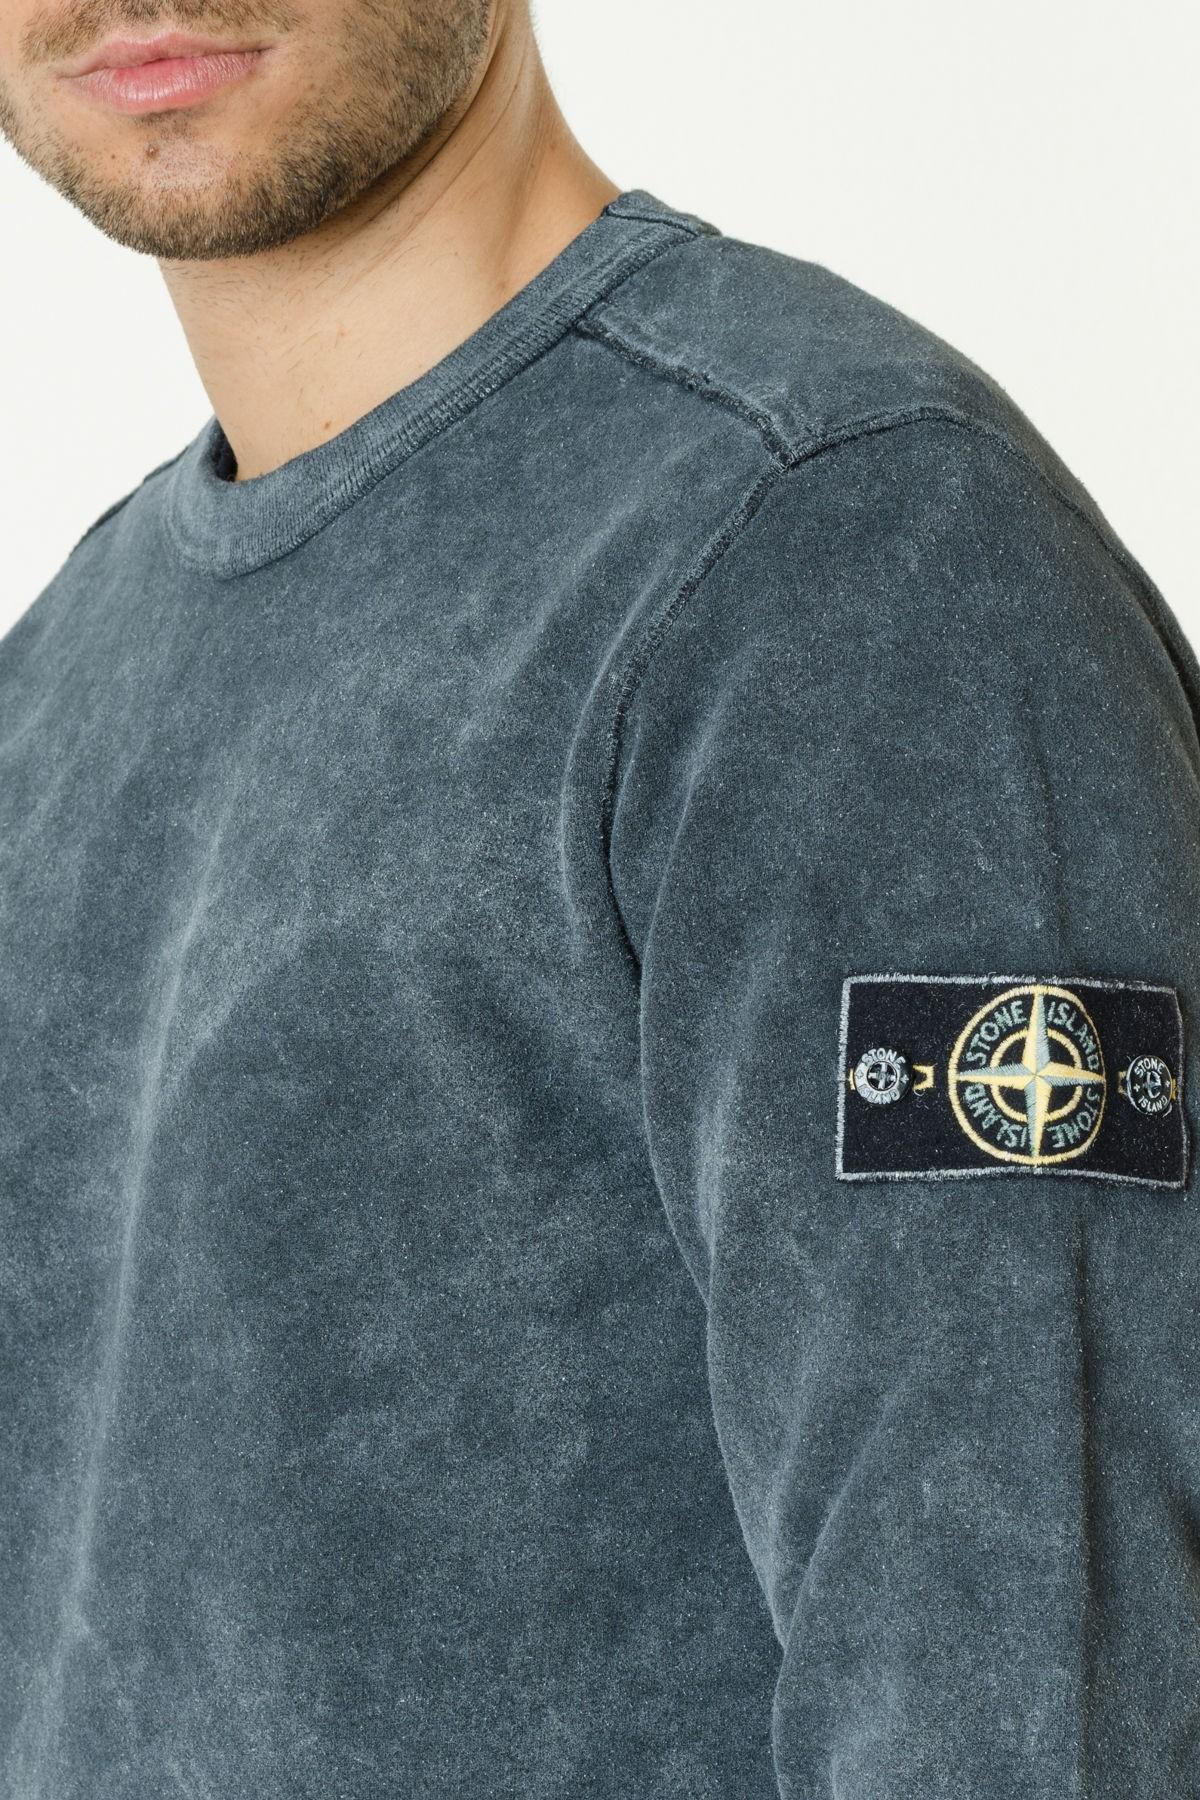 brand new 2f502 1f112 Sweater for man STONE ISLAND F/W 17-18 - Rione Fontana